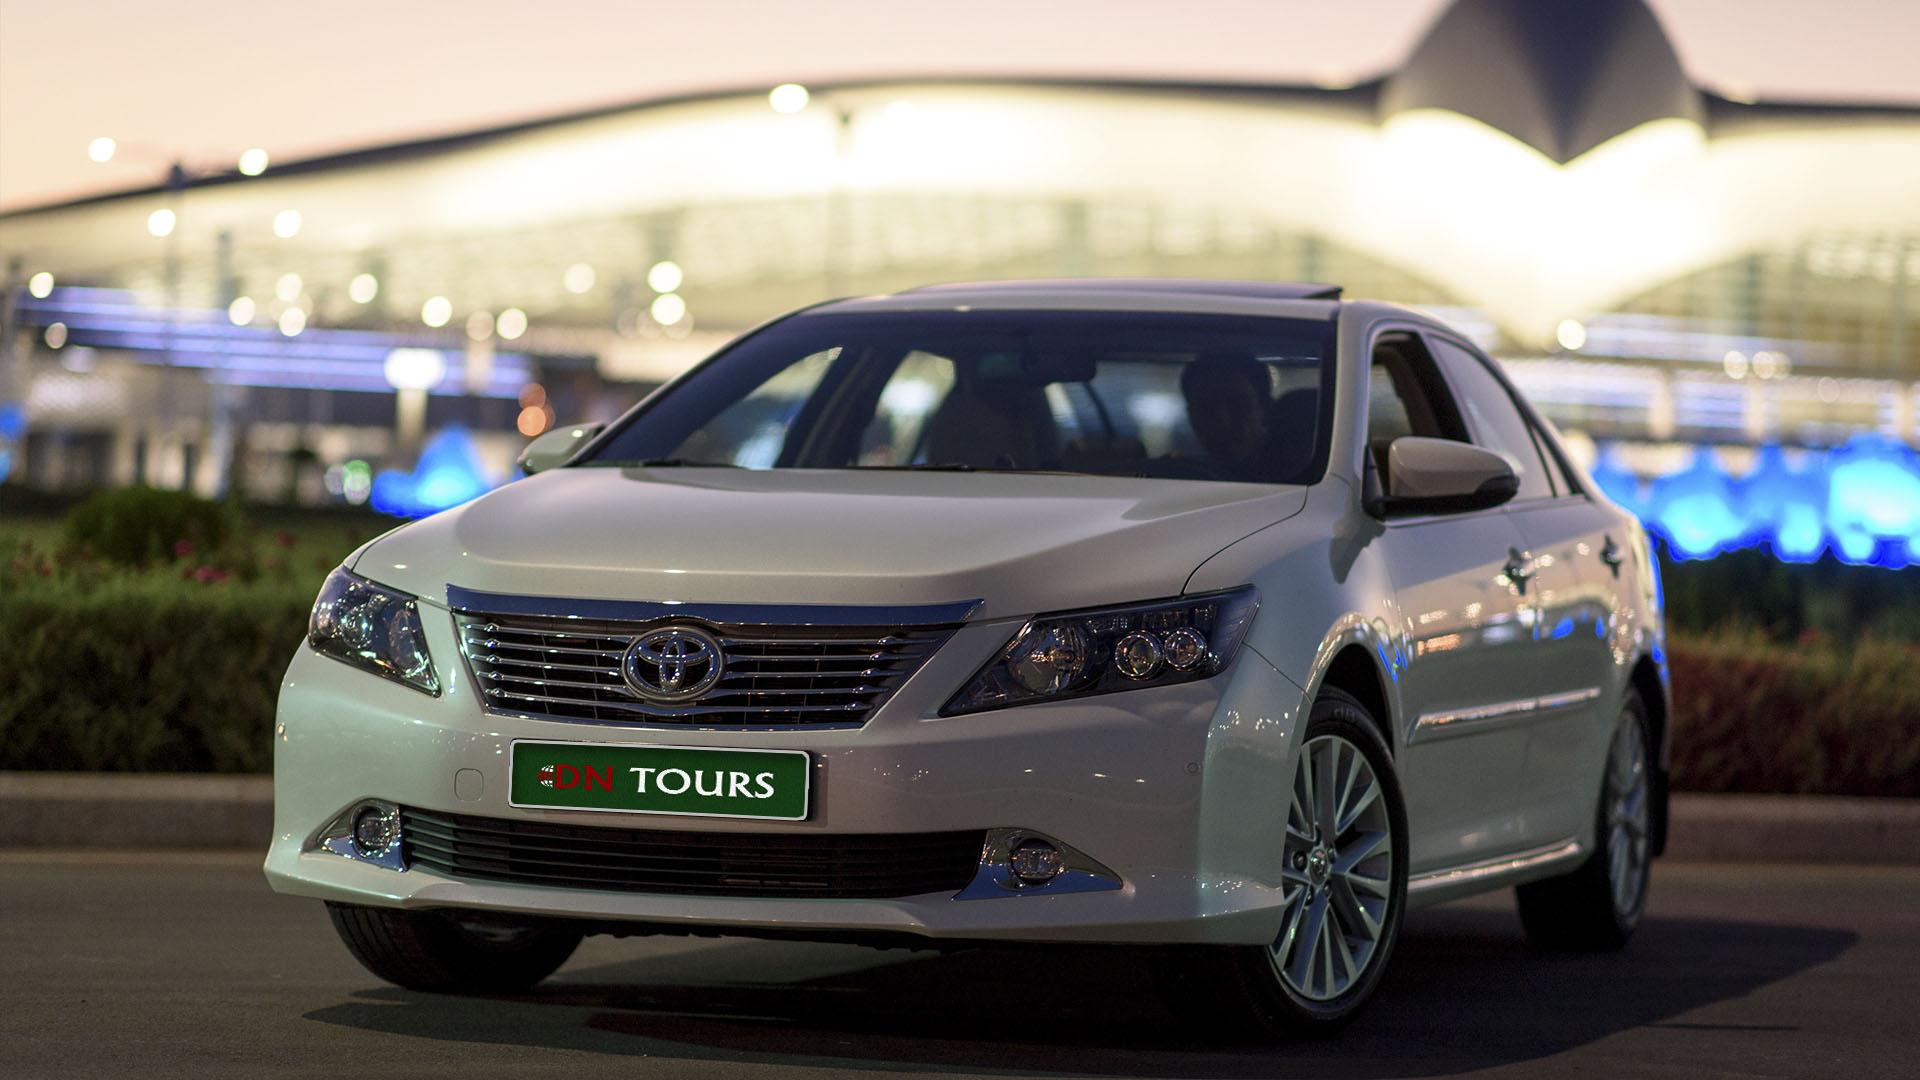 Автопарк DN Tours, туристическое агенство, аренда автомобиля Туркменистан